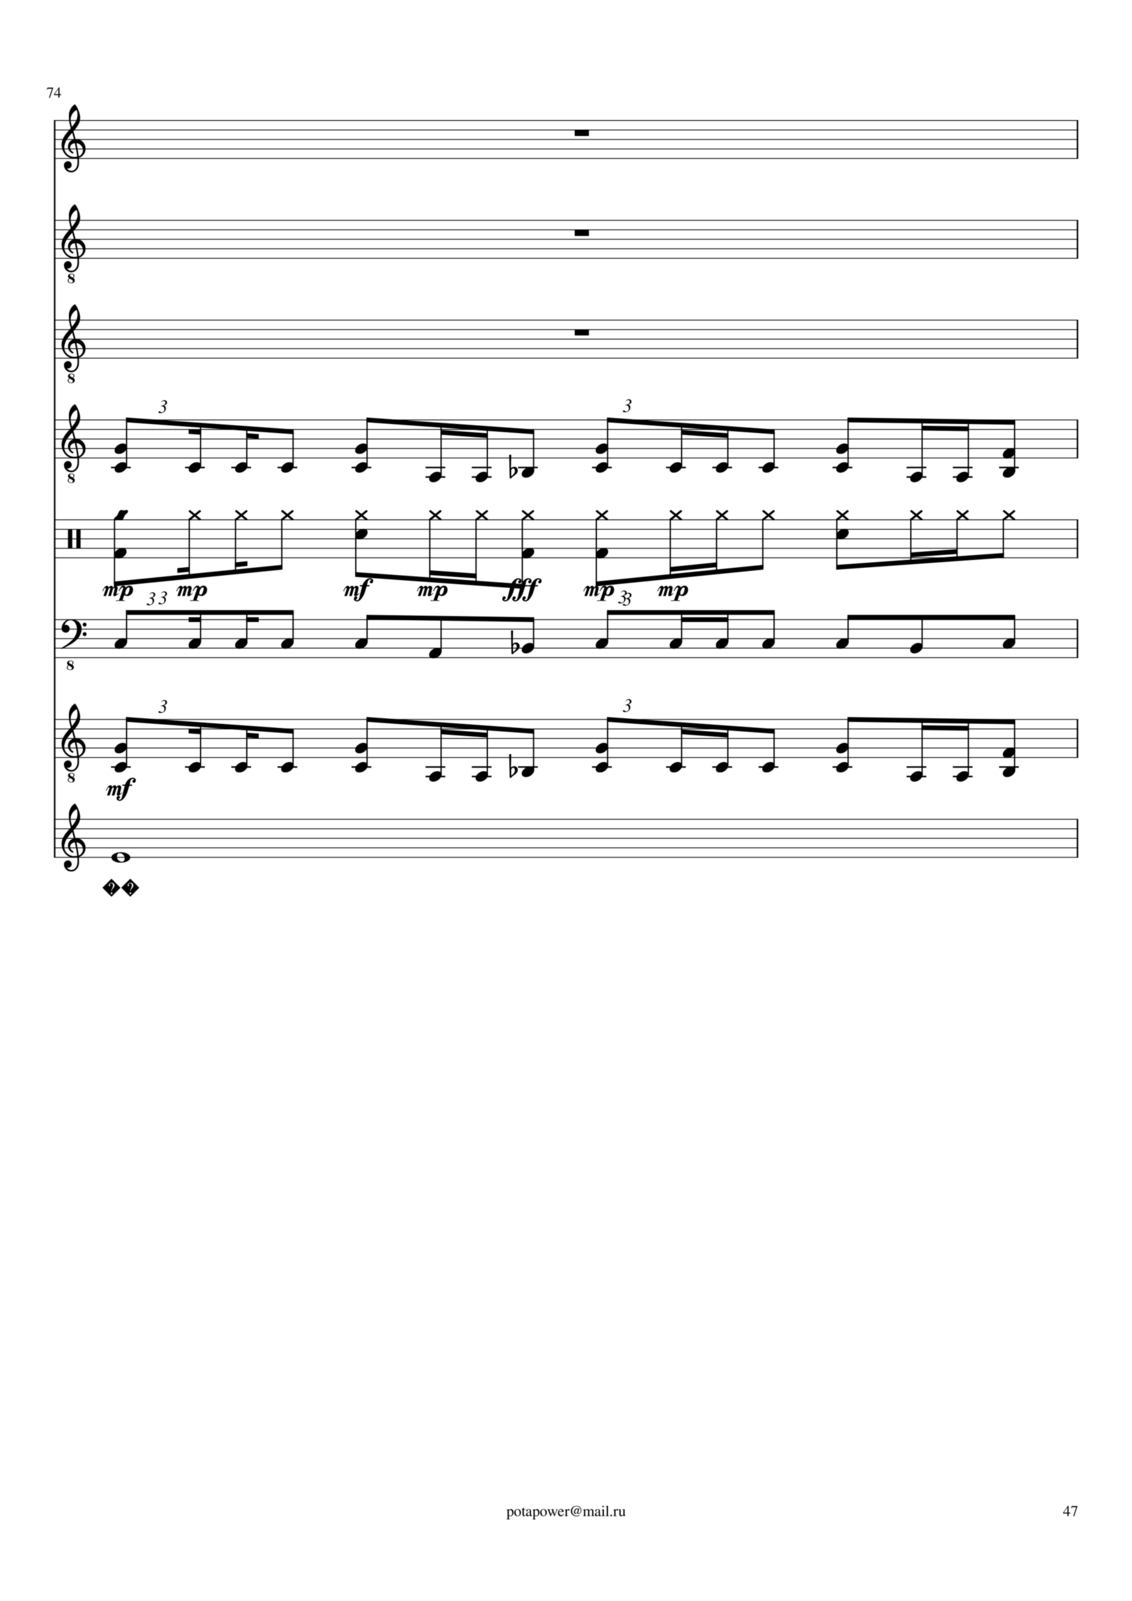 Korolevstvo slez slide, Image 47